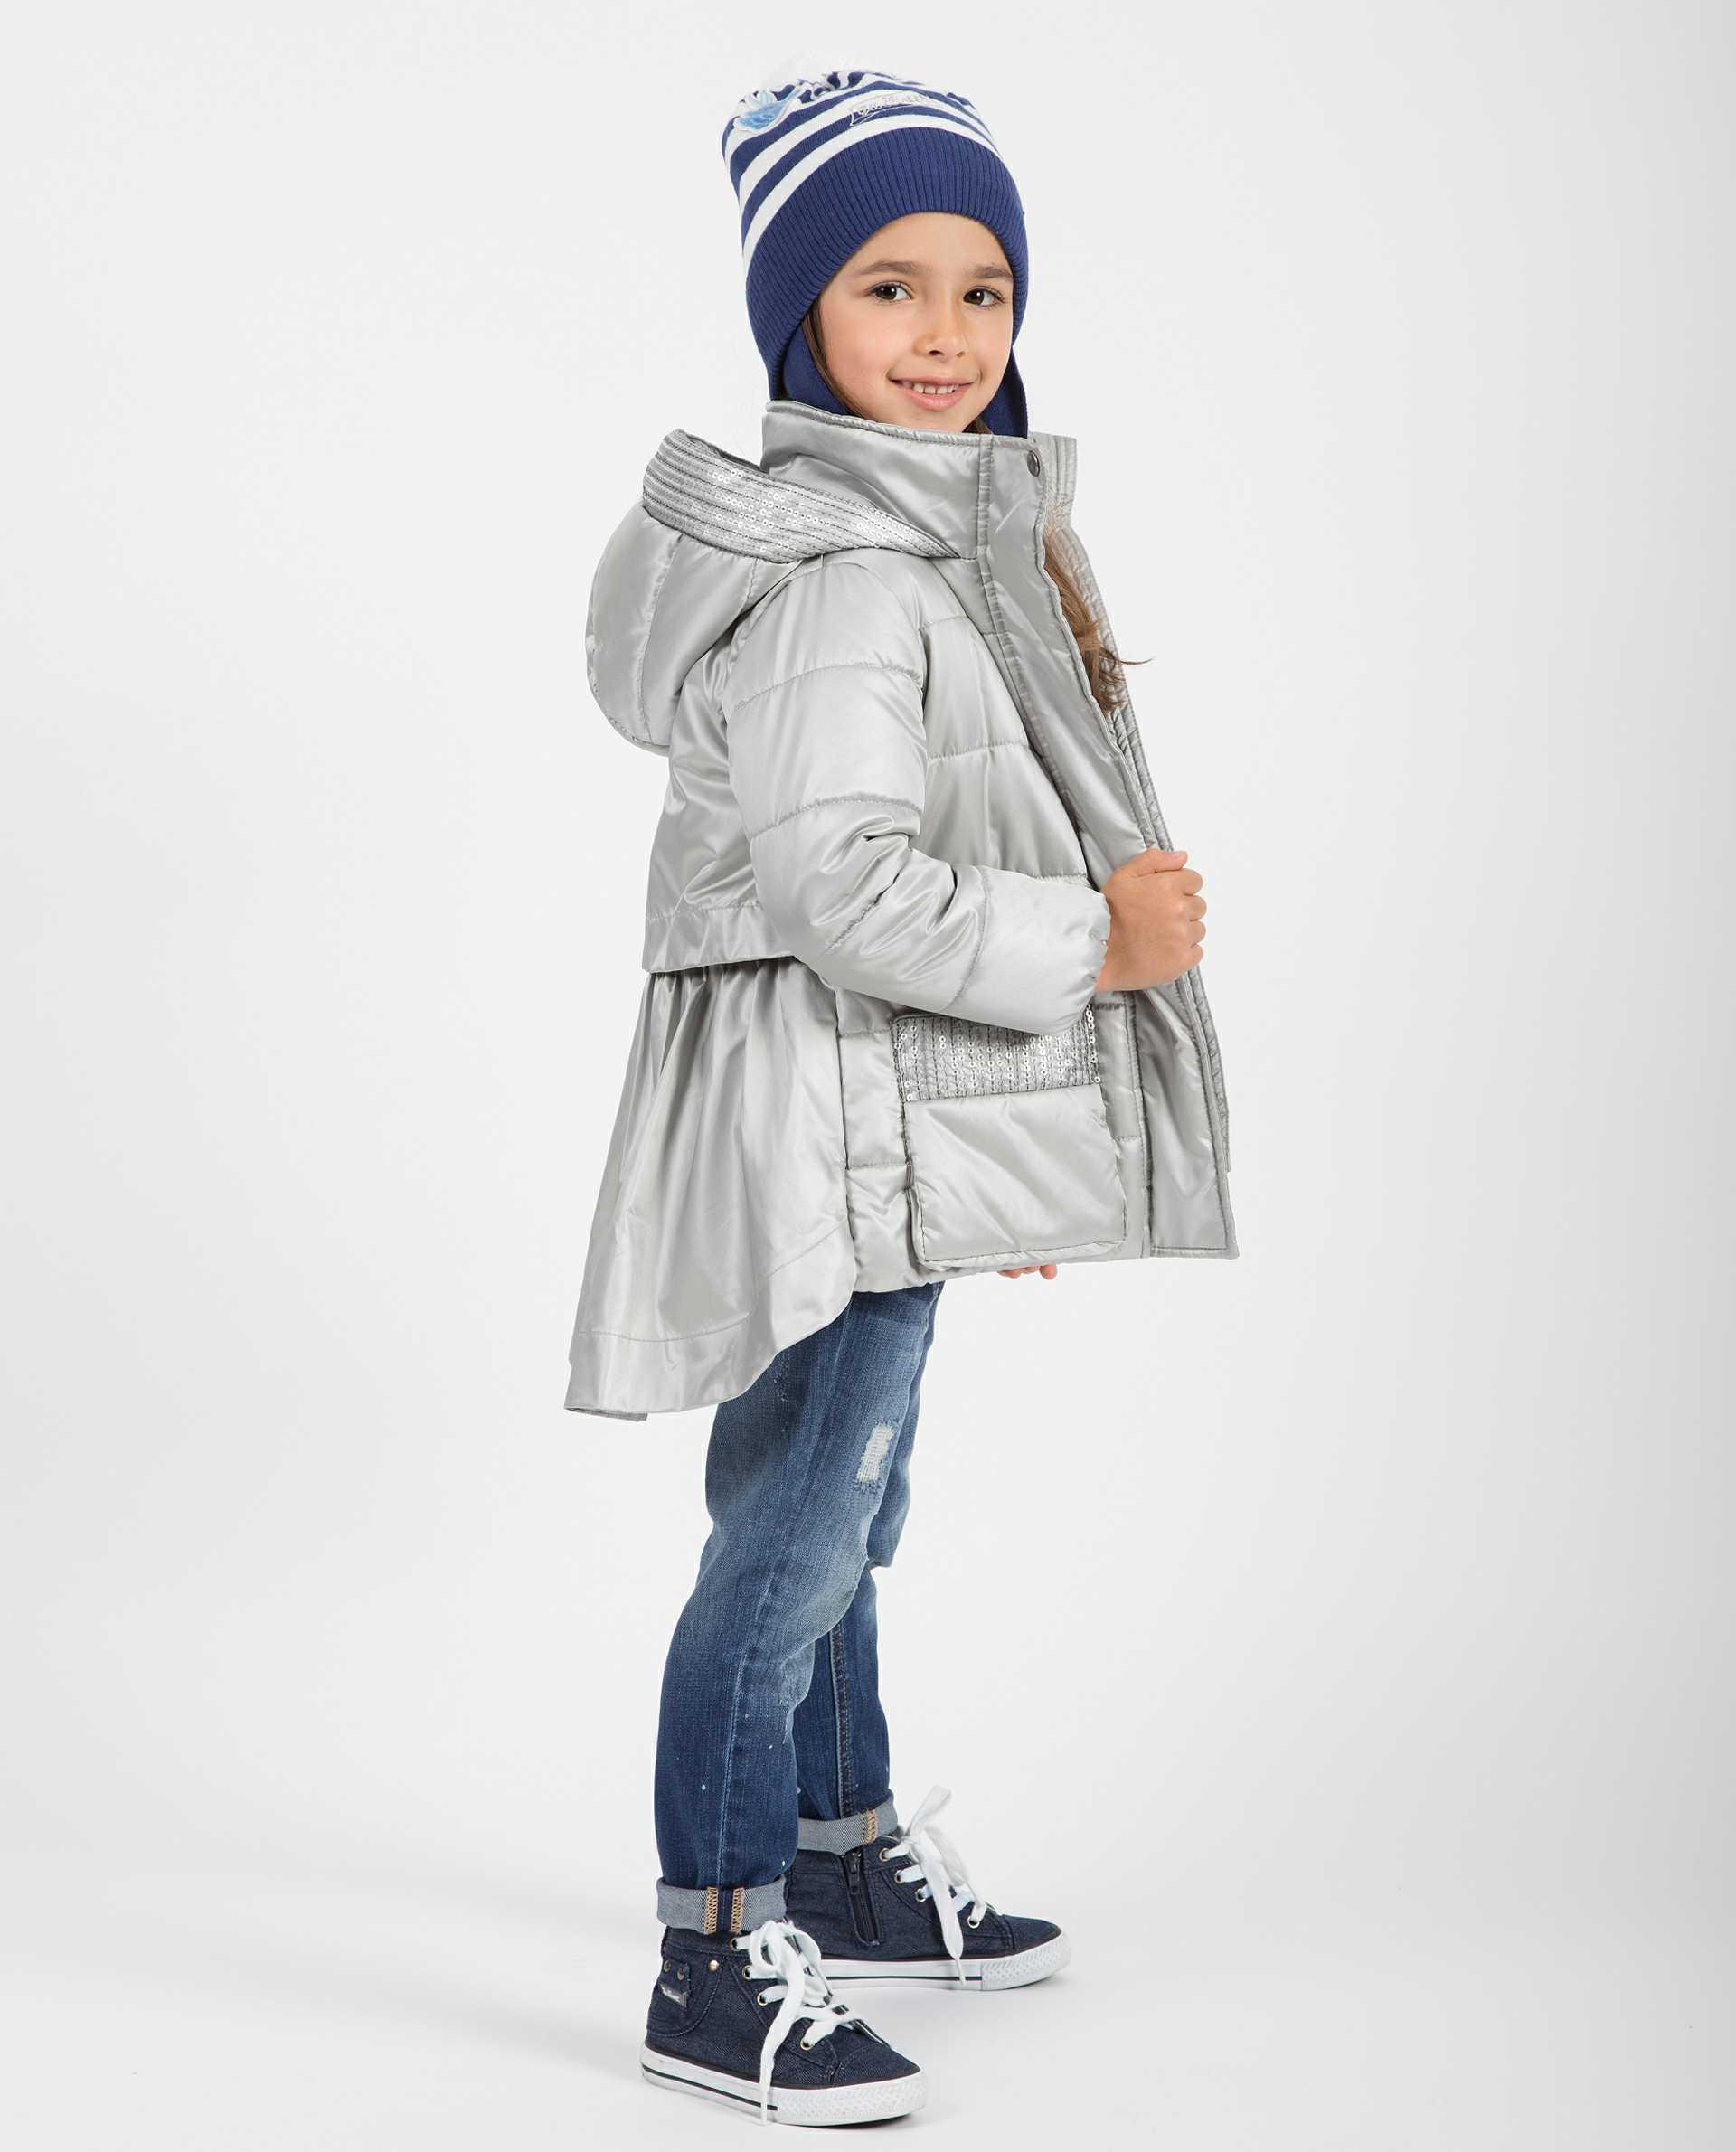 Gulliver从事儿童服装订制品牌定制加工